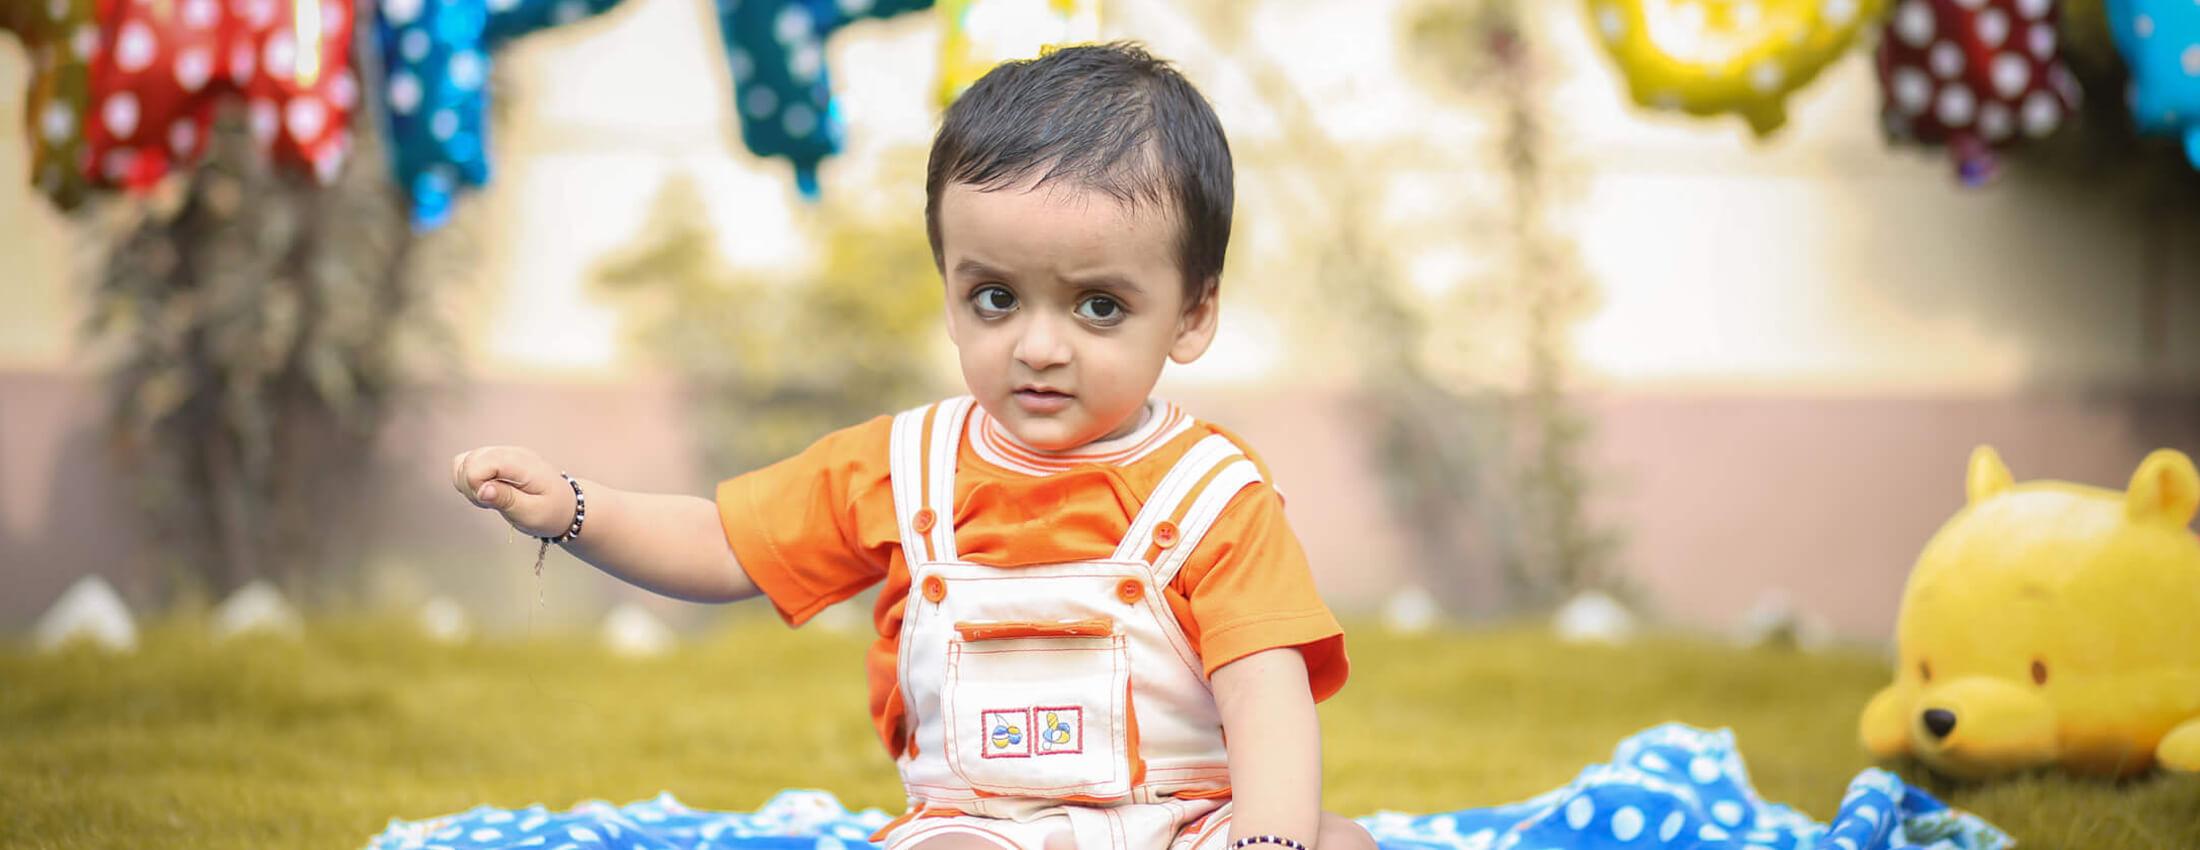 Sumit Baby Photoshoot - Imgstock, Biratnagar